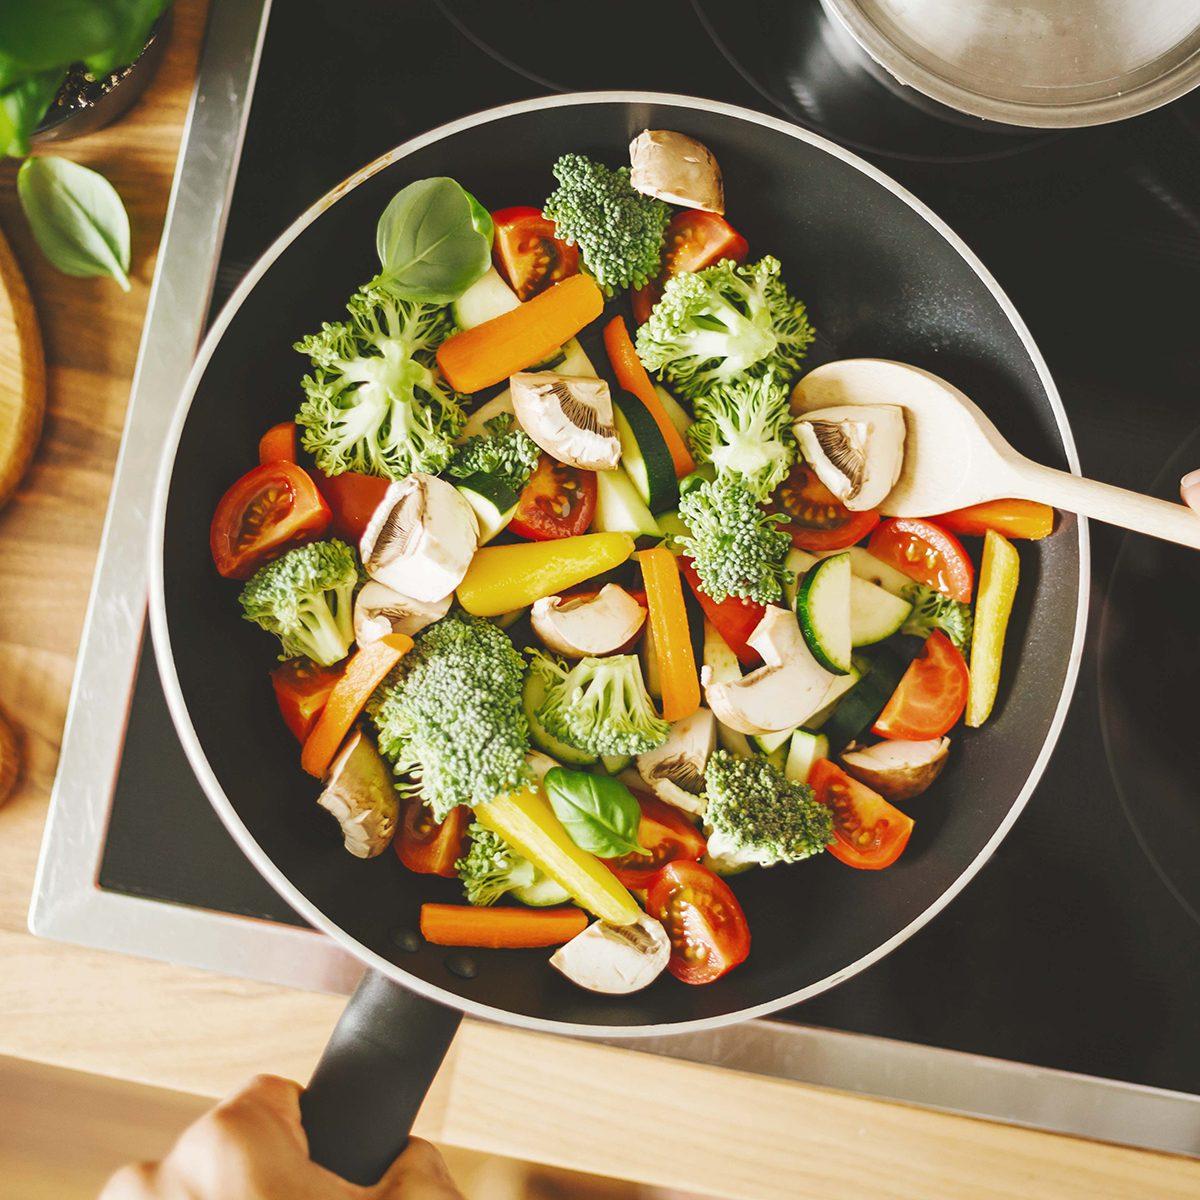 Sautéing veggies in a skillet